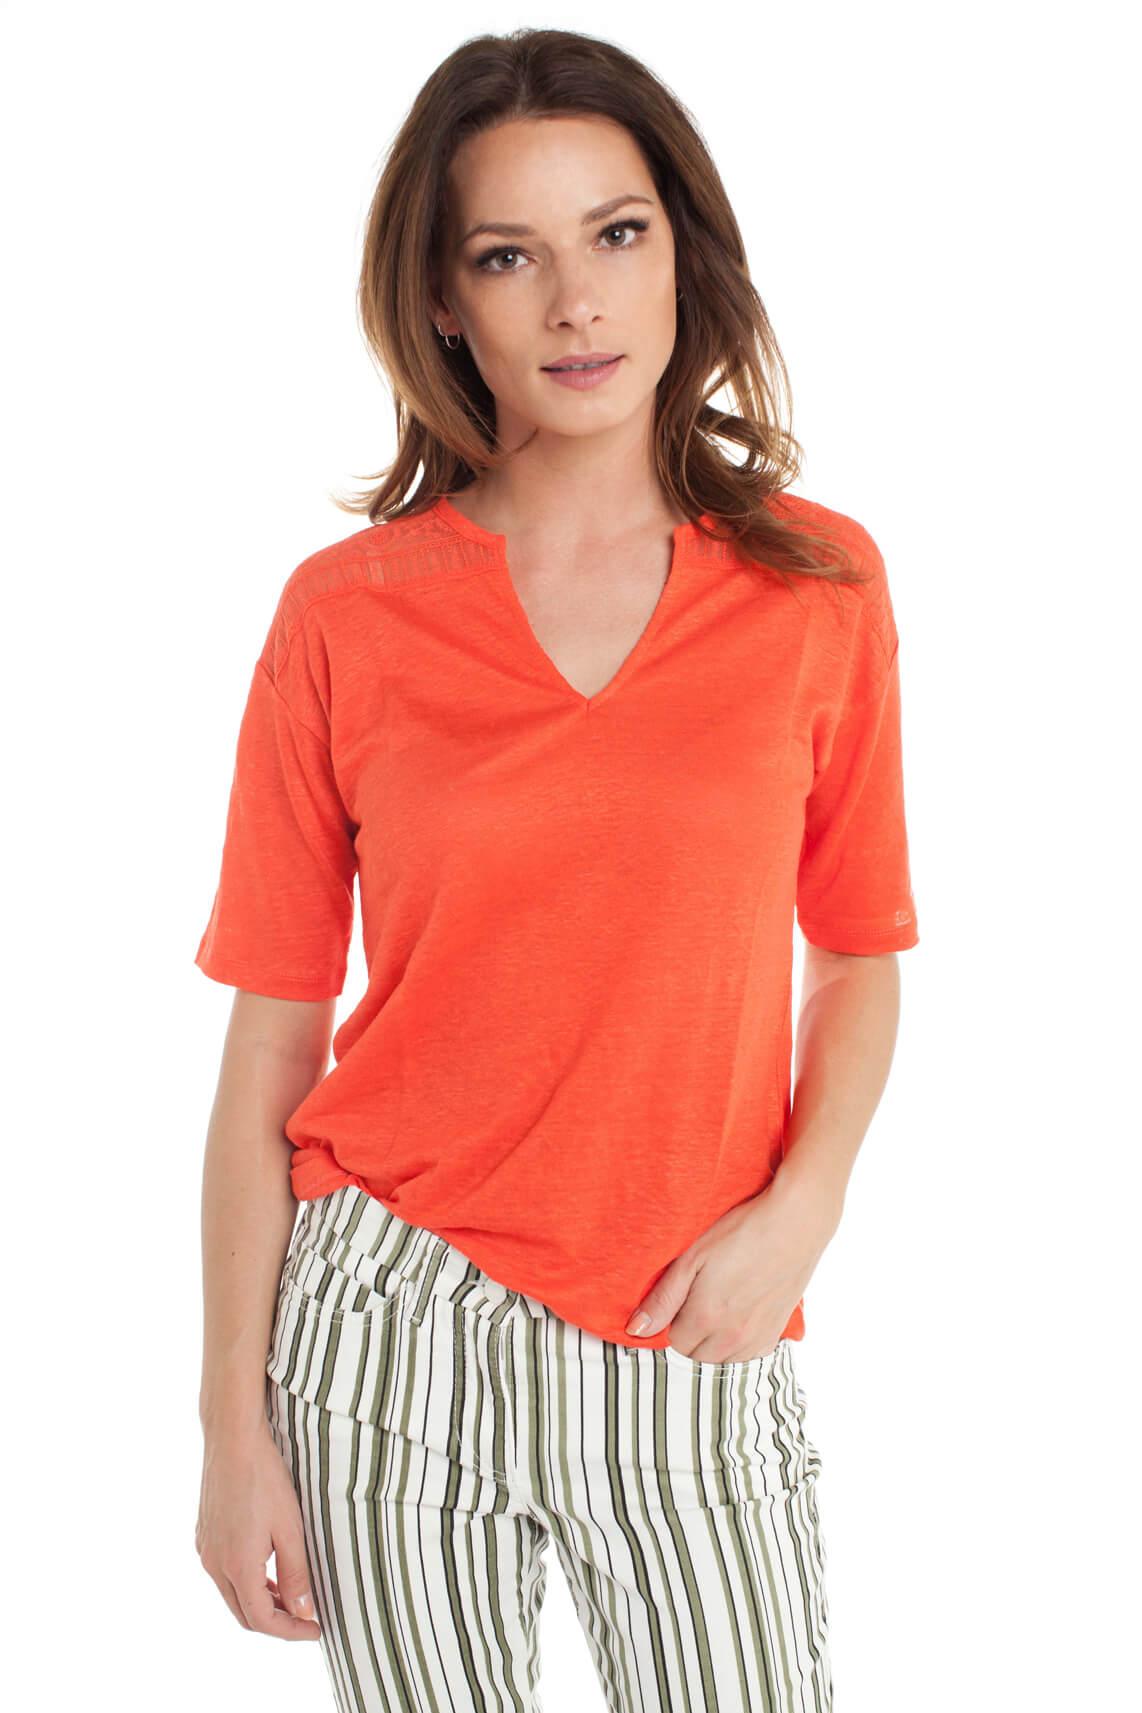 La Fée Maraboutée Dames Shirt met kanten detail Rood